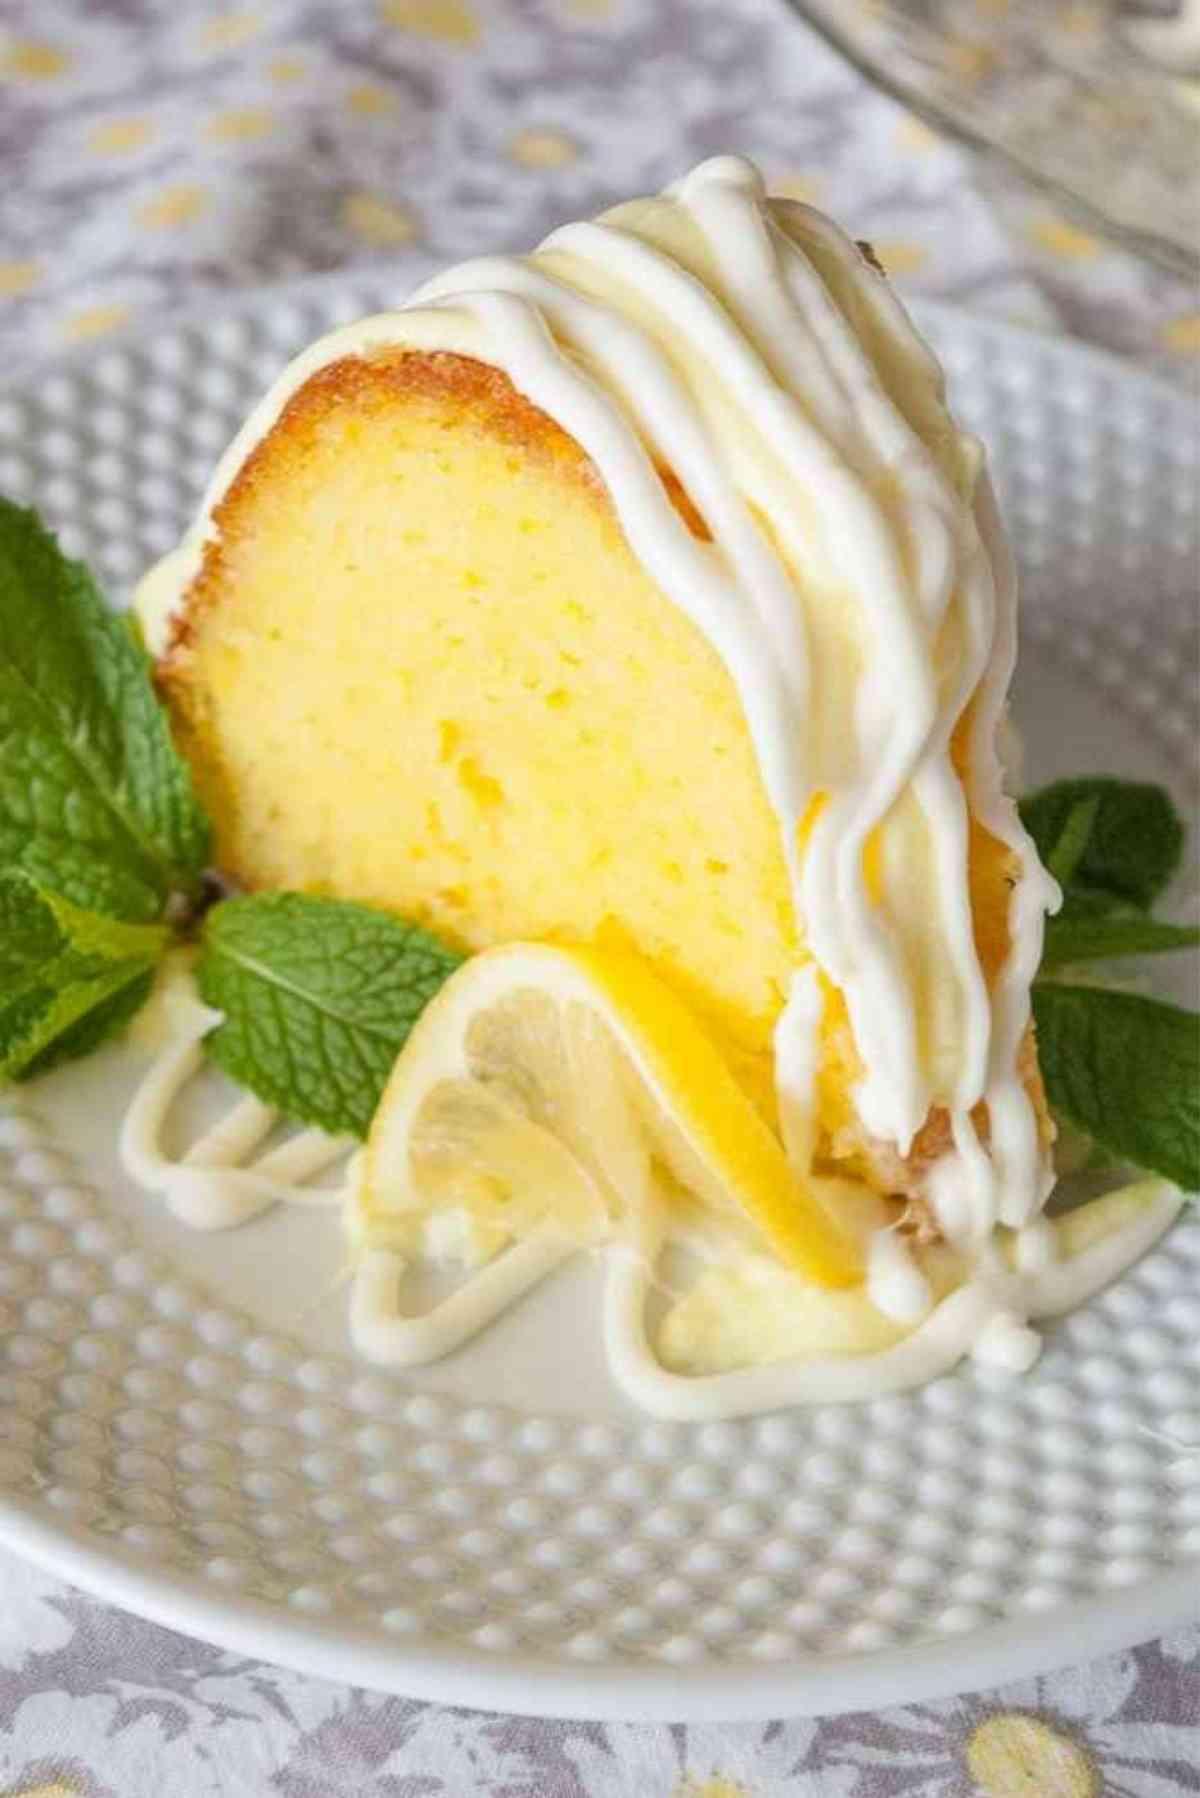 Slice of lemon bundt cake iced and garnished with mint leaves.